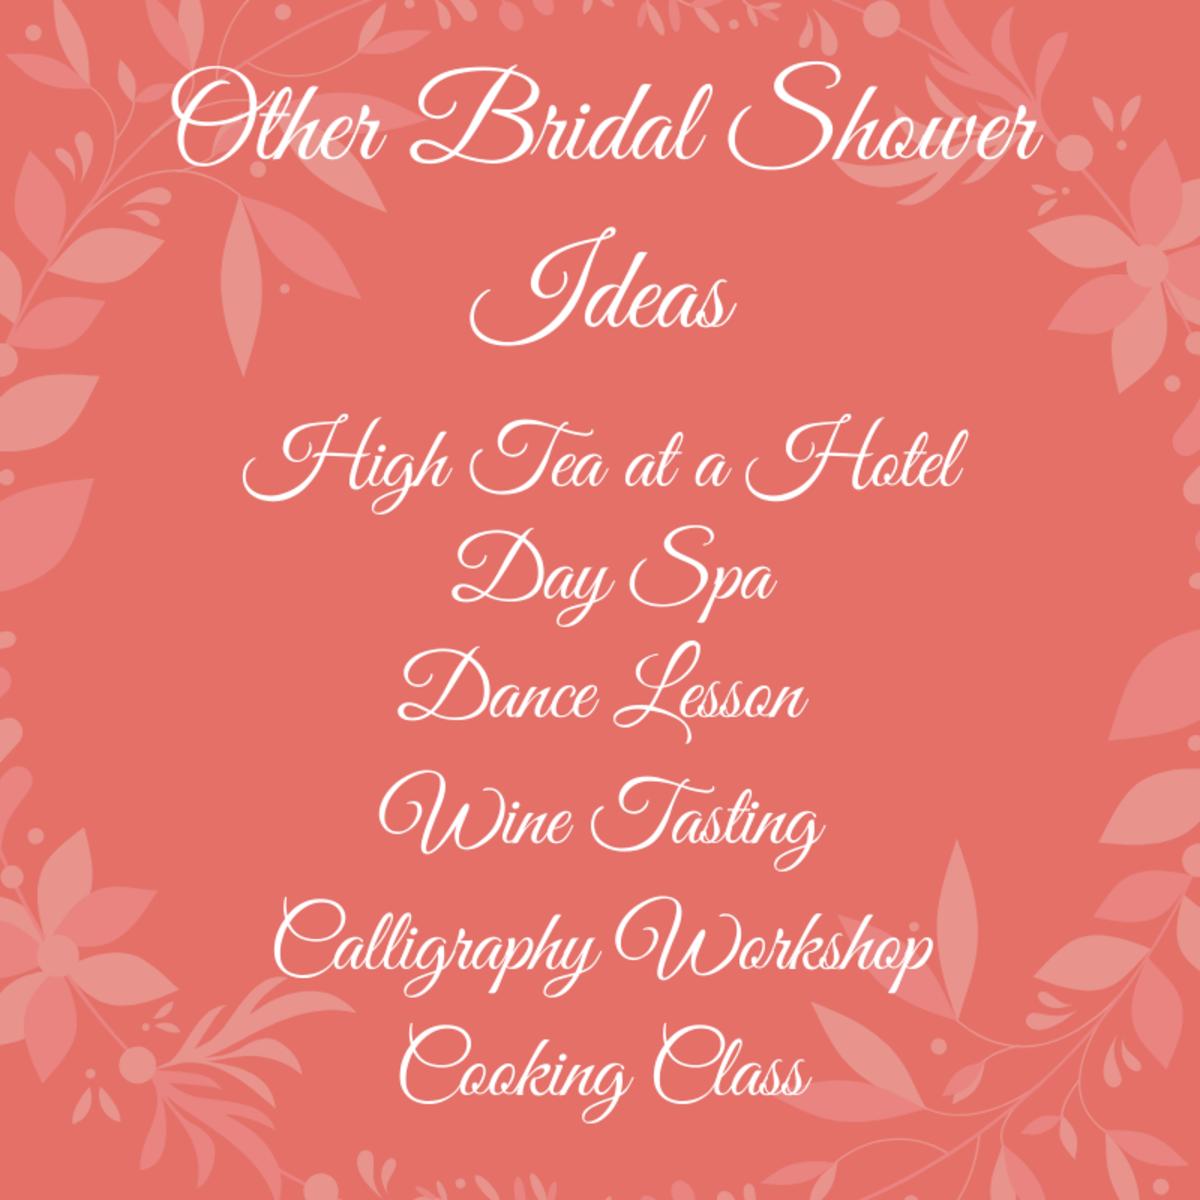 More Bridal Shower Ideas